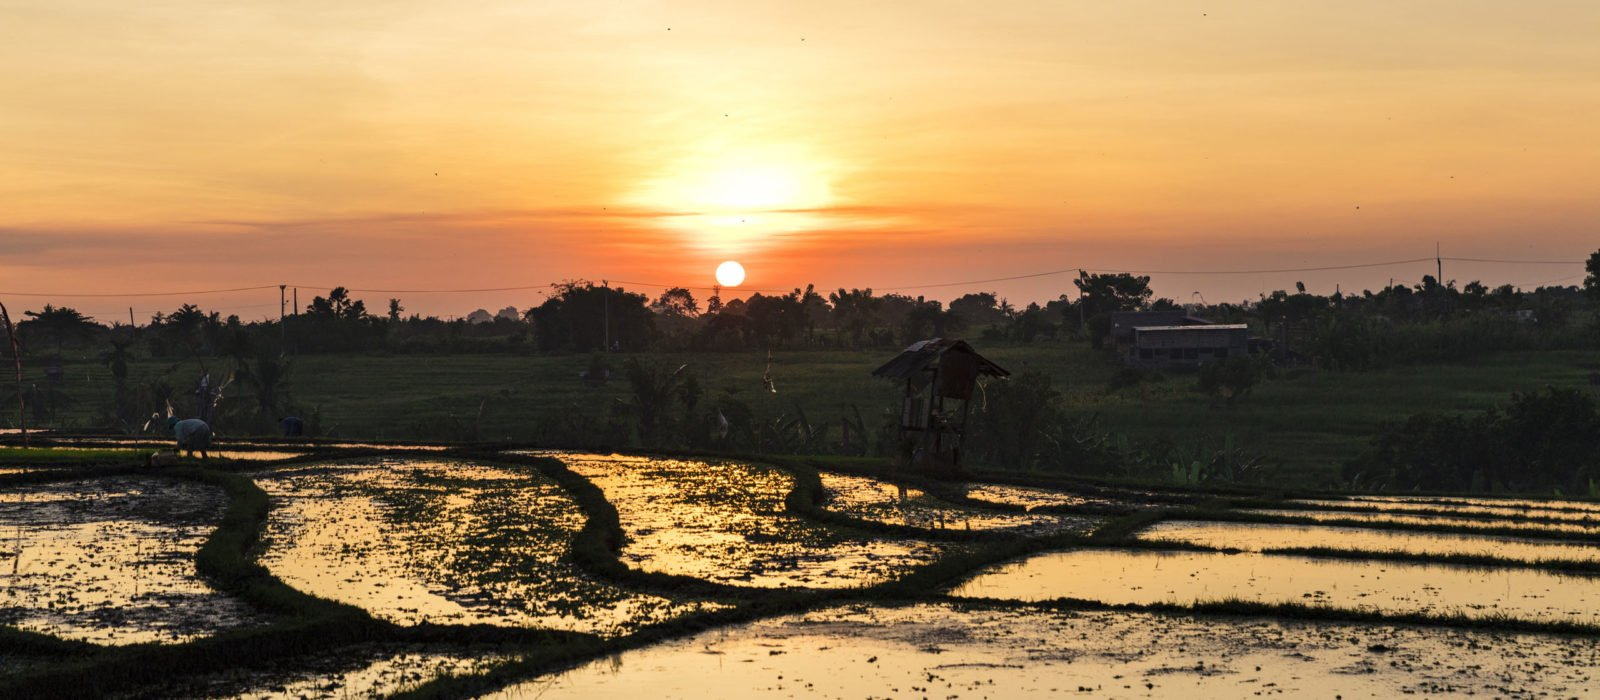 sunset-rice-fields-canggu-bali-indonesia